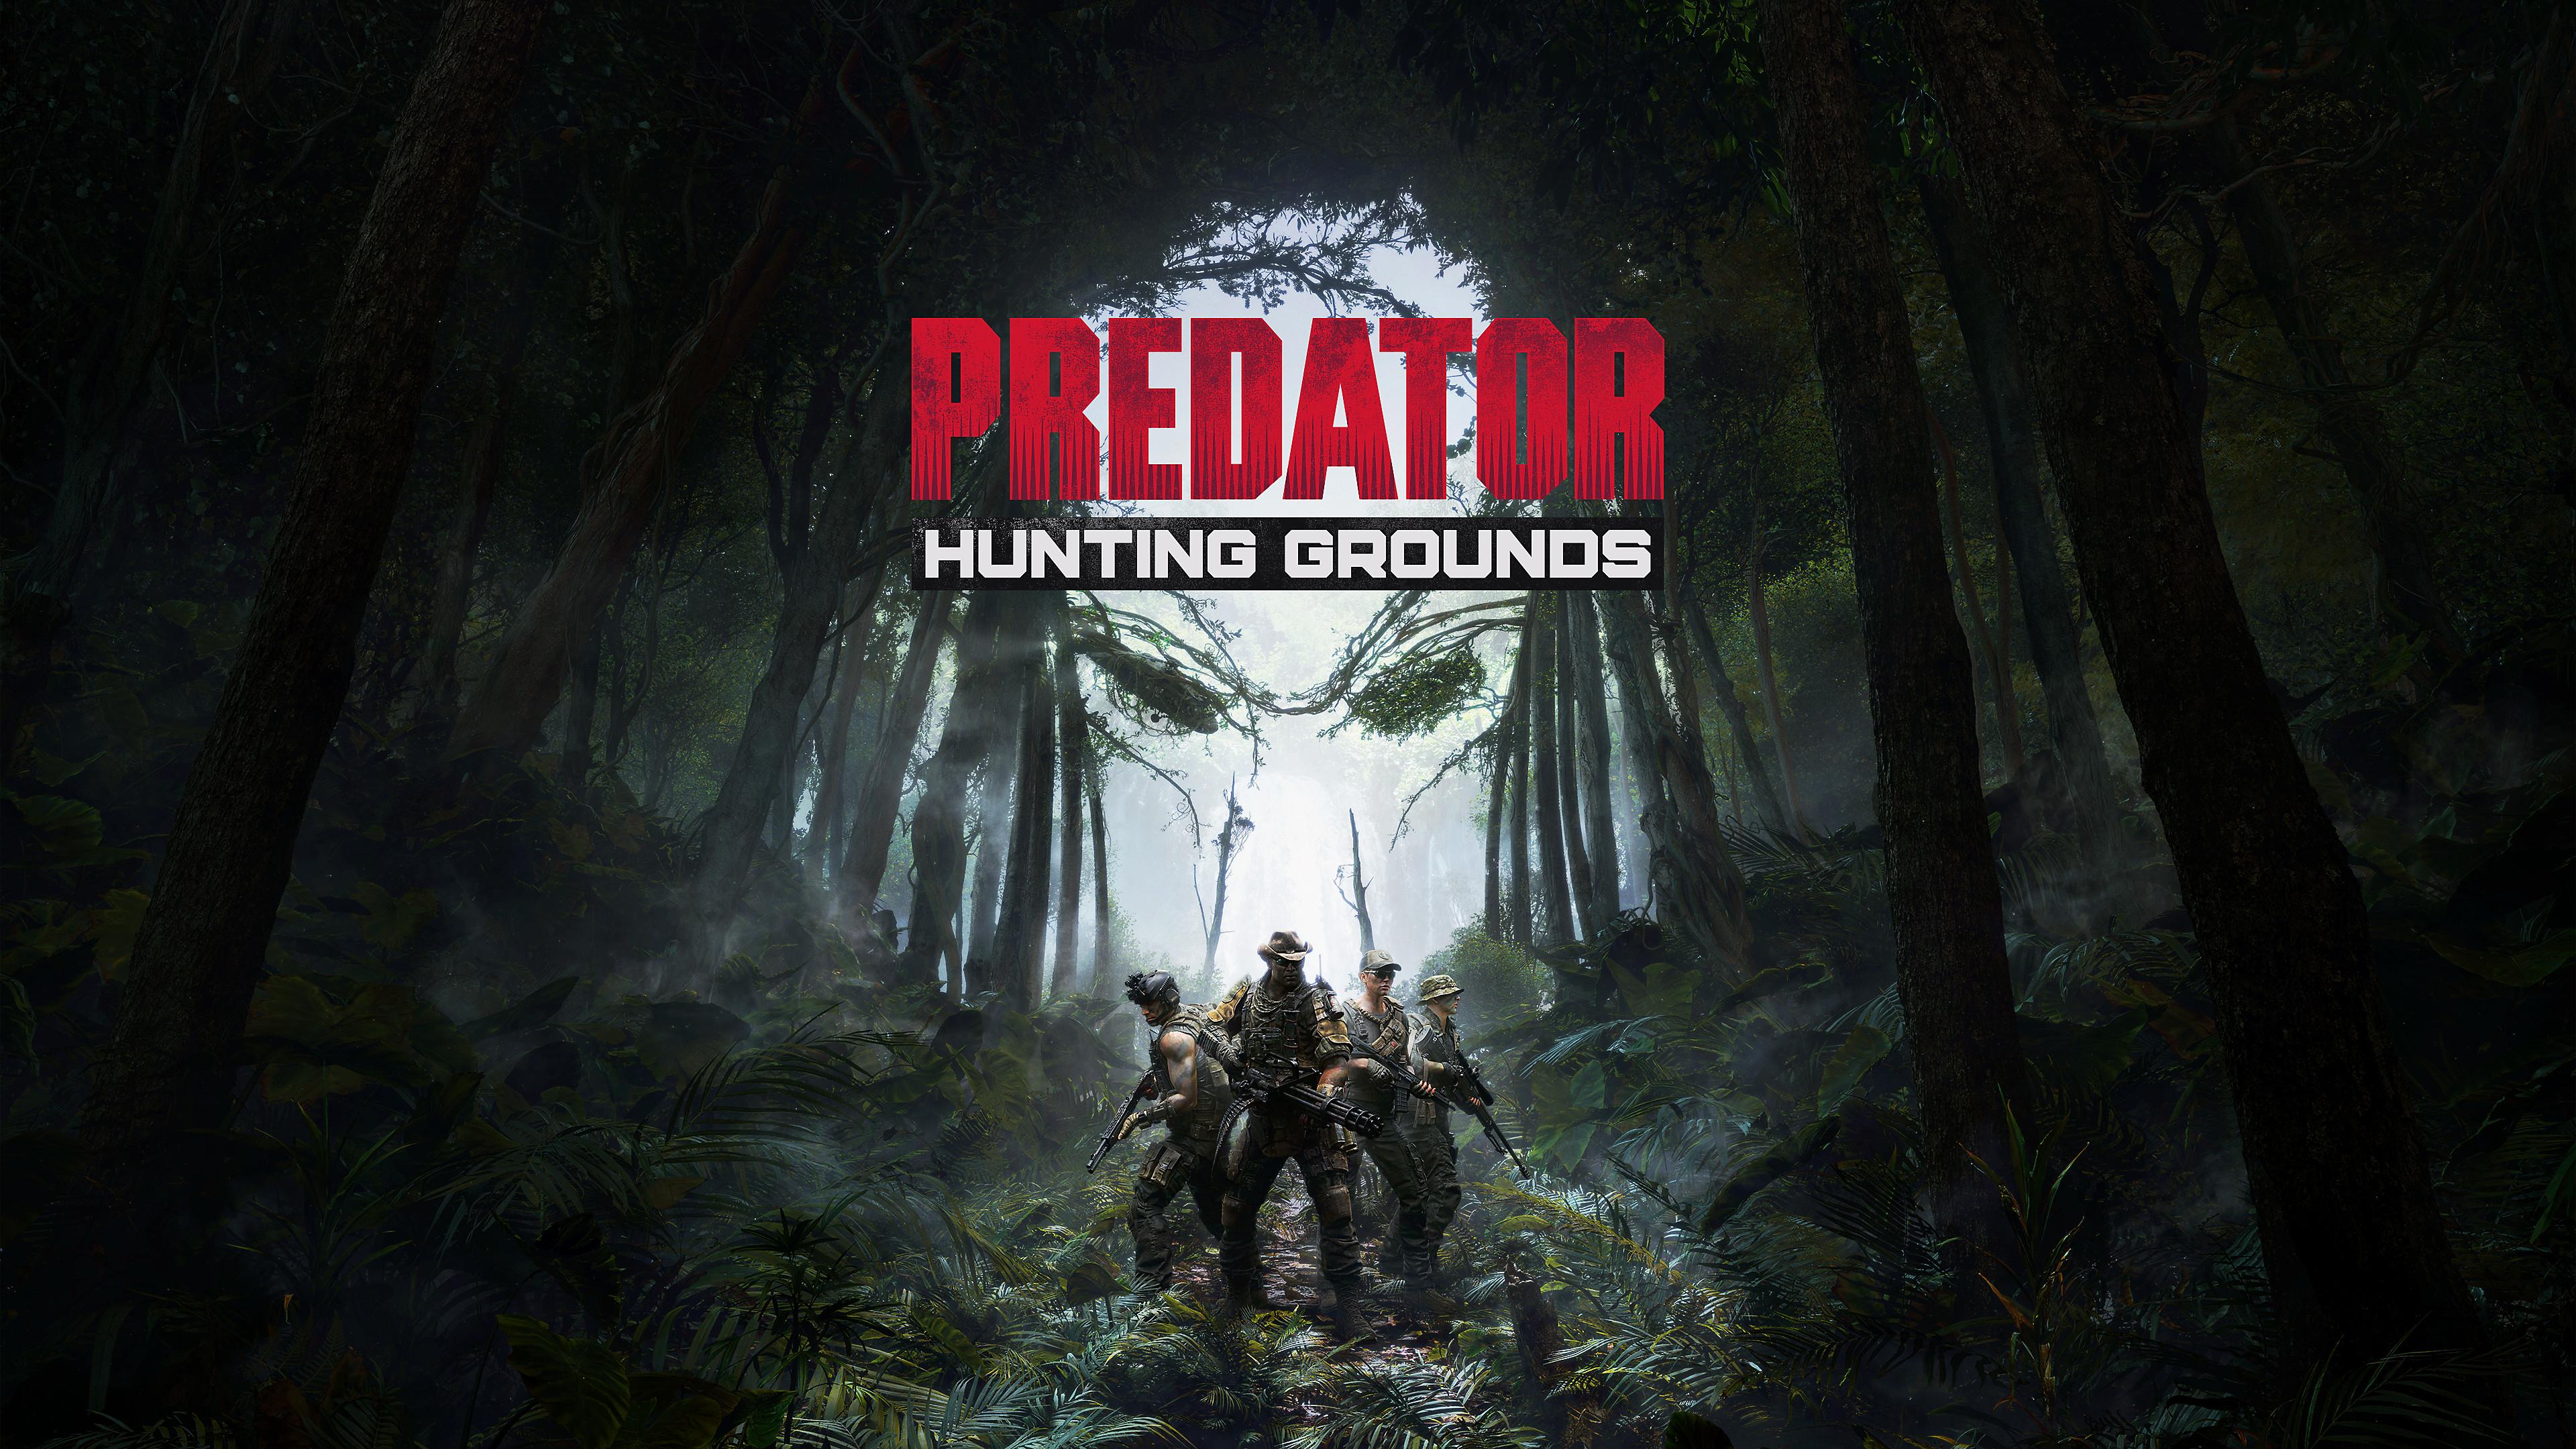 Predator: Hunting Grounds Decorative Background